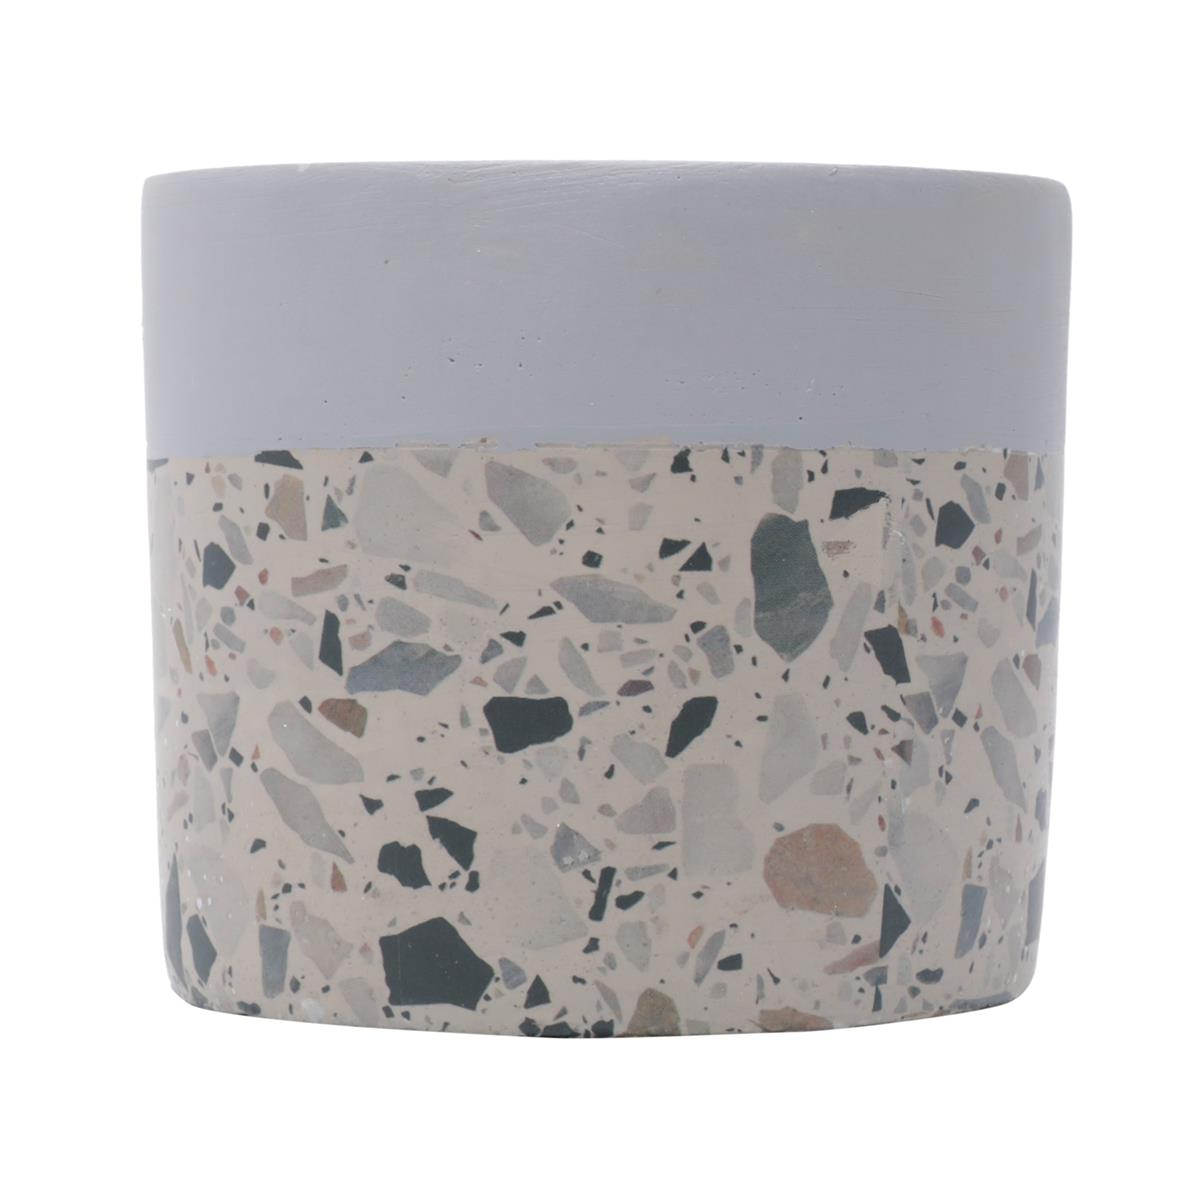 Cachepot concreto Granilite Fossil Stardust cinza/bege 8,5x7,5cm Urban